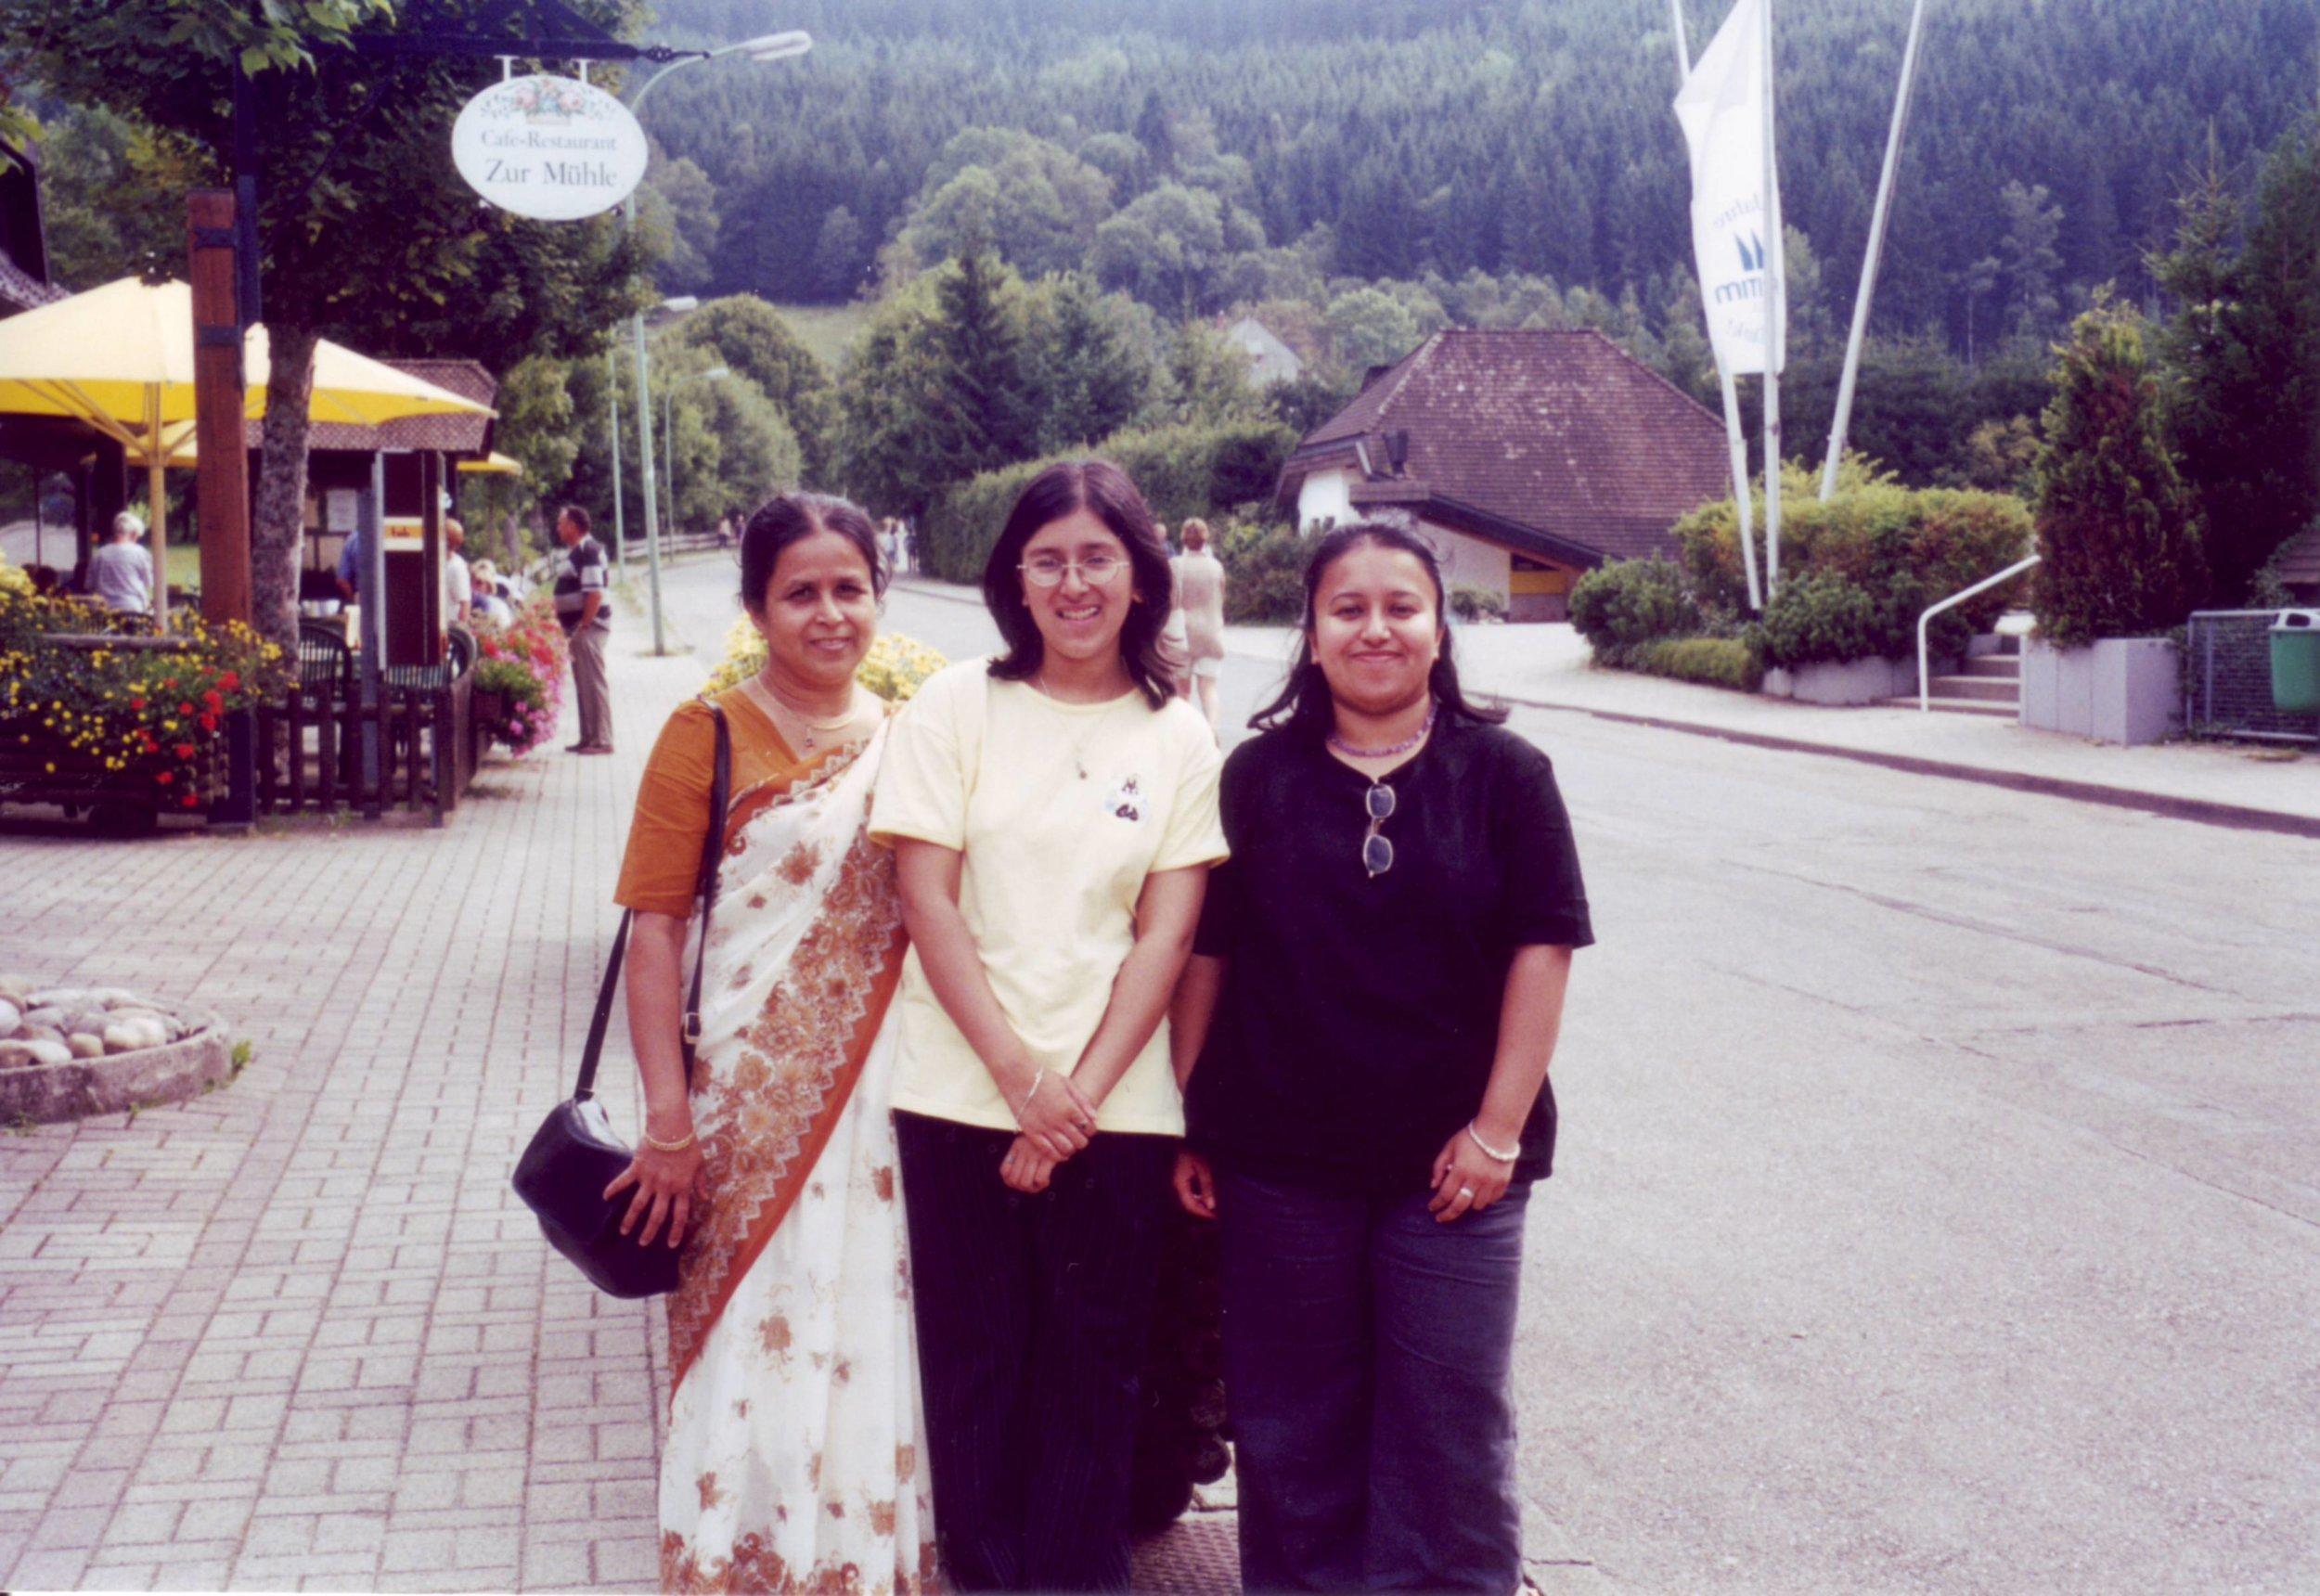 - Me my mum and sister through my teenage years